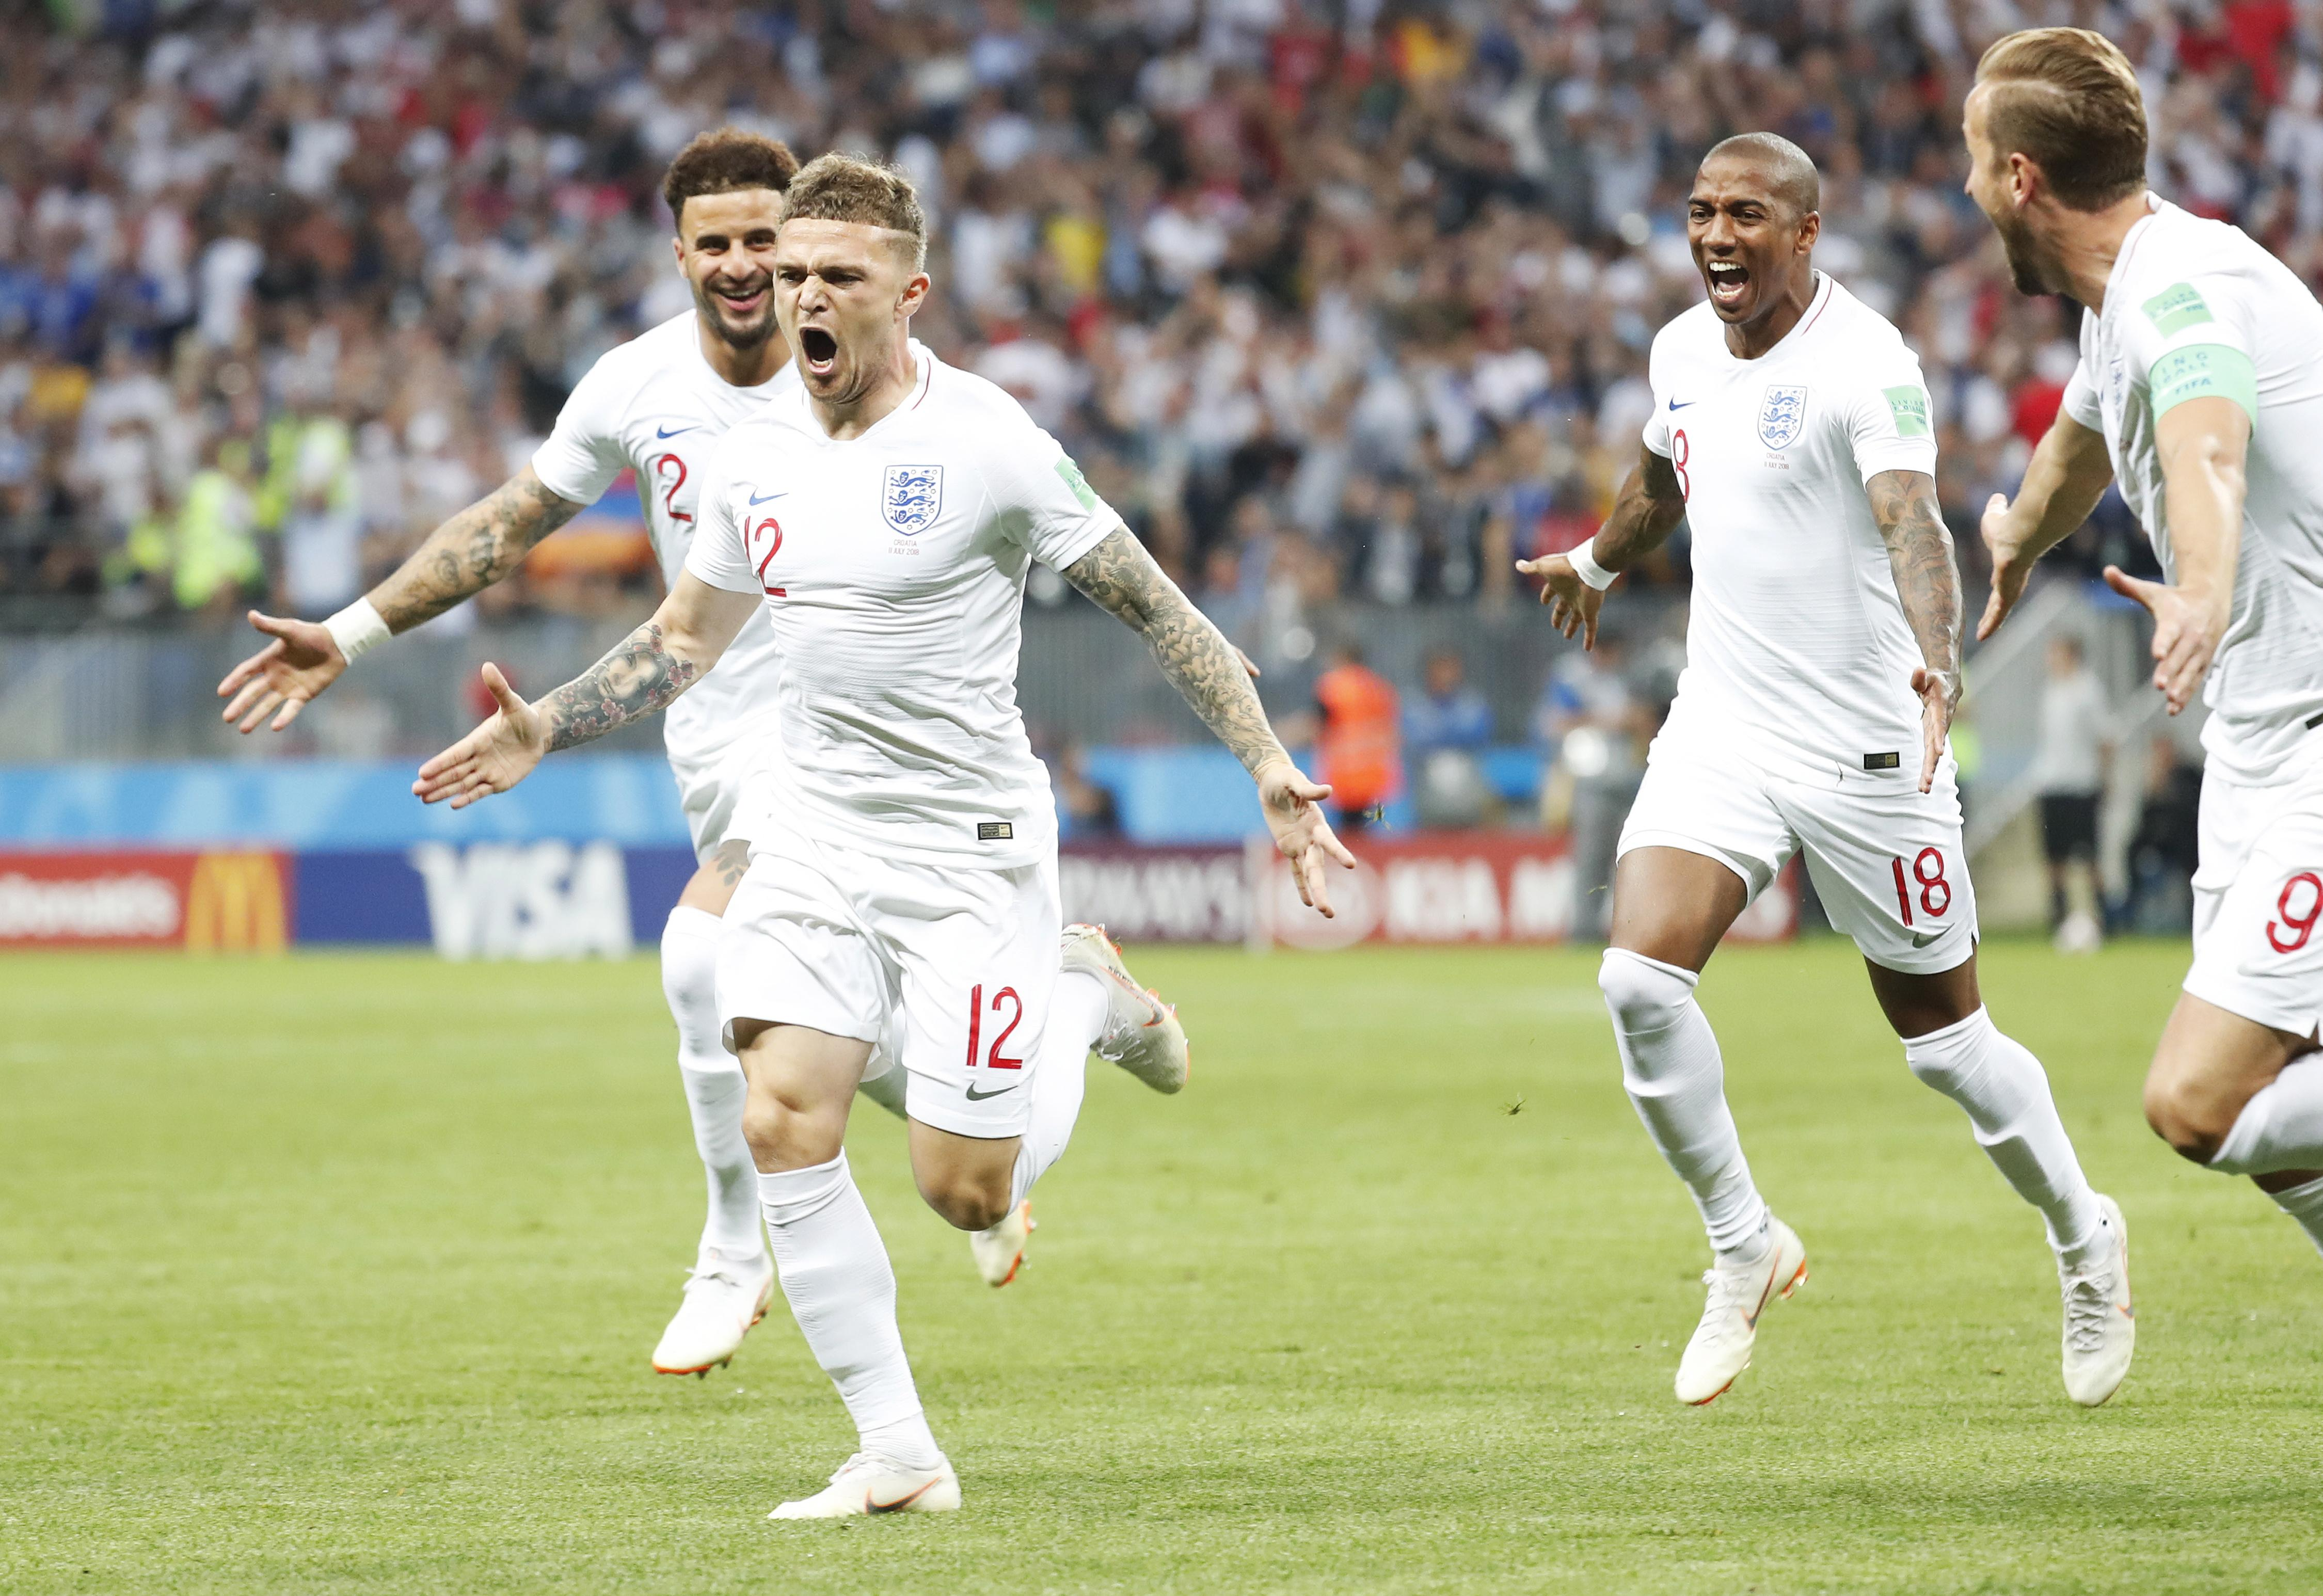 The Bury Beckham